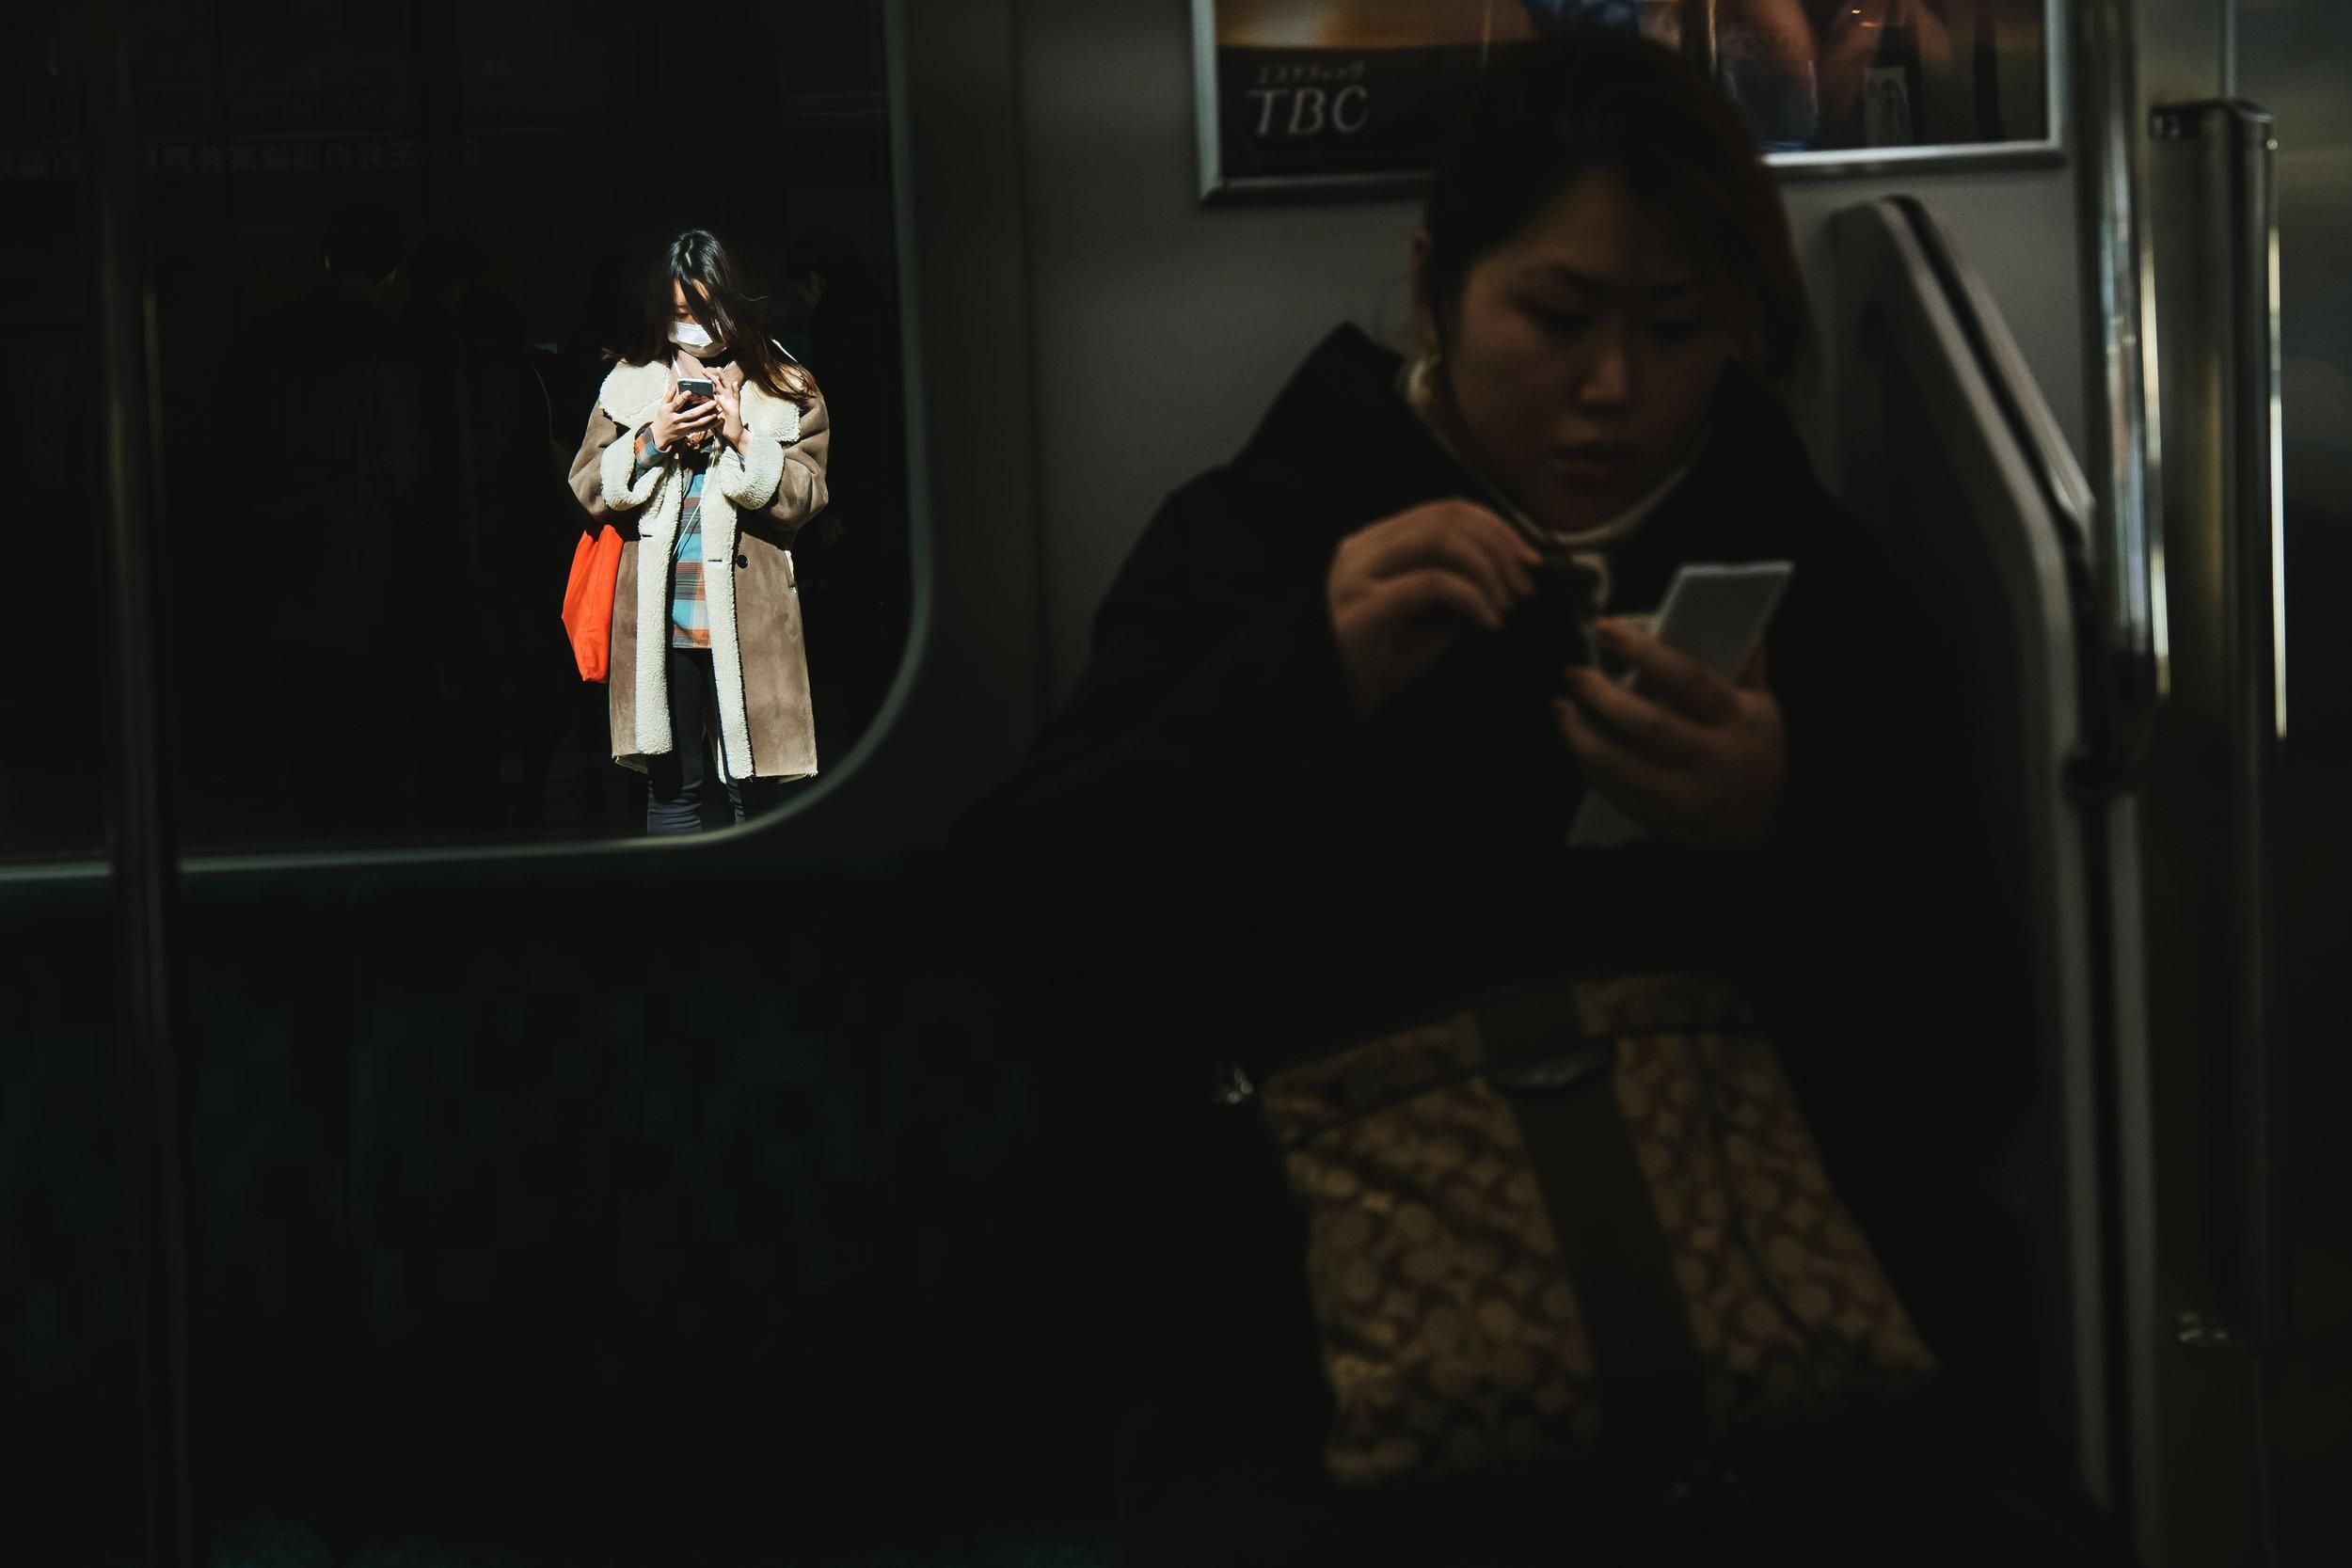 phone-girls-commute.jpg